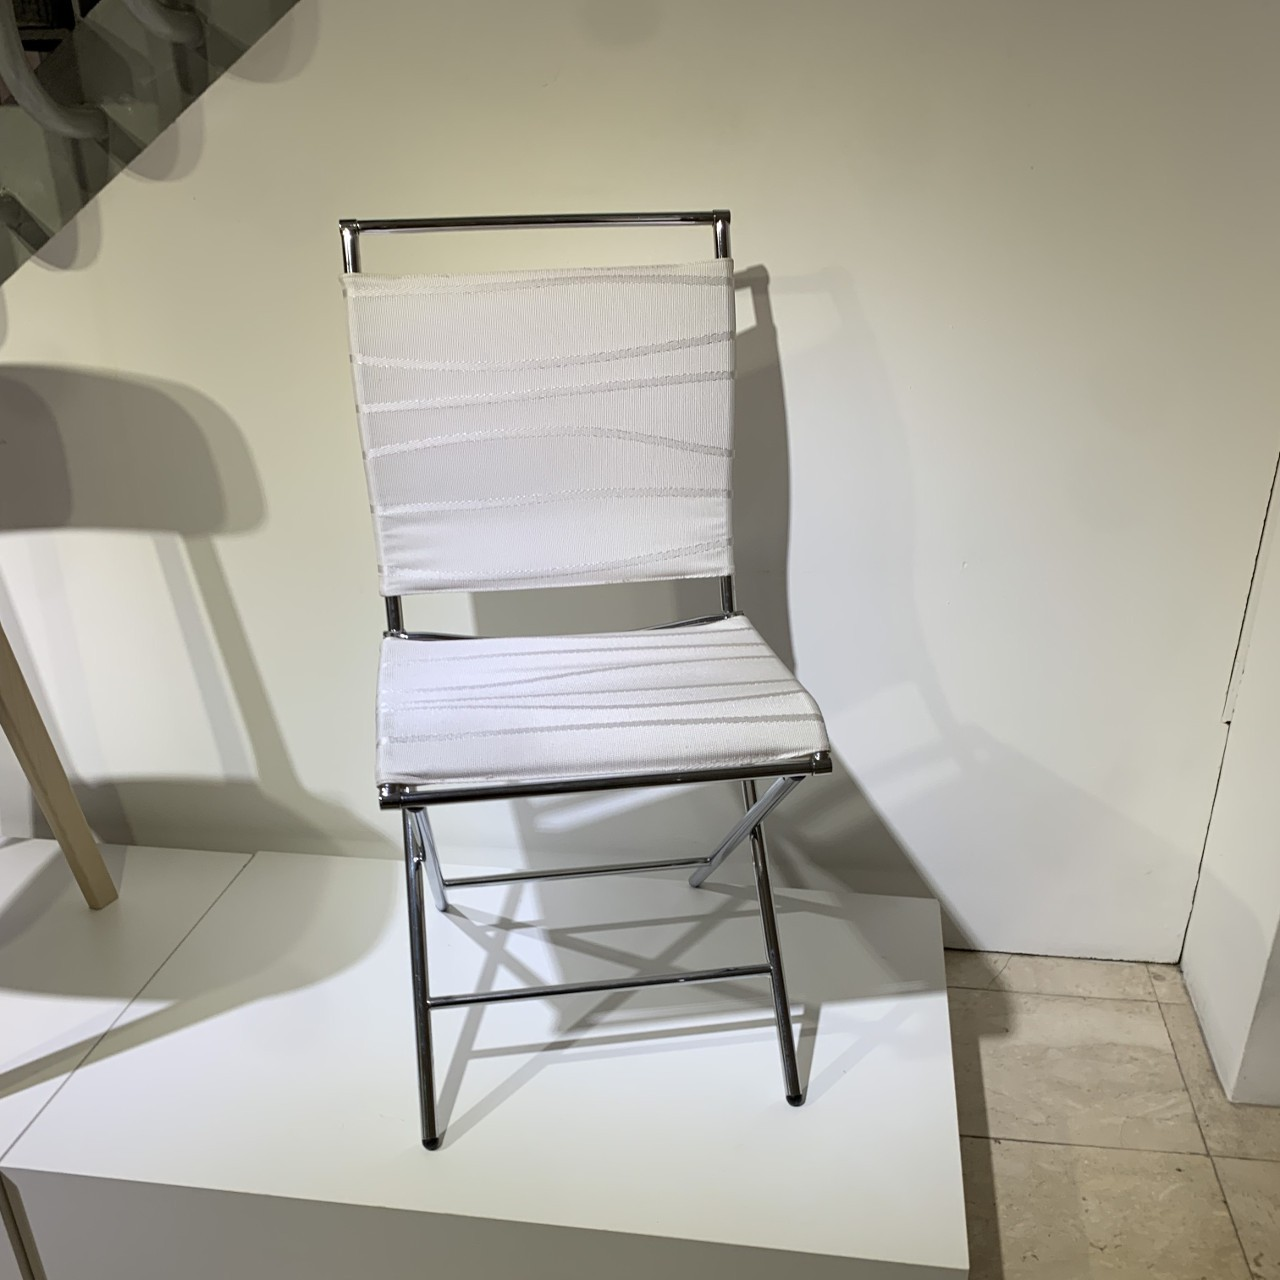 Air folding sedia pieghevole outlet calligaris torino for Spazio arredo torino